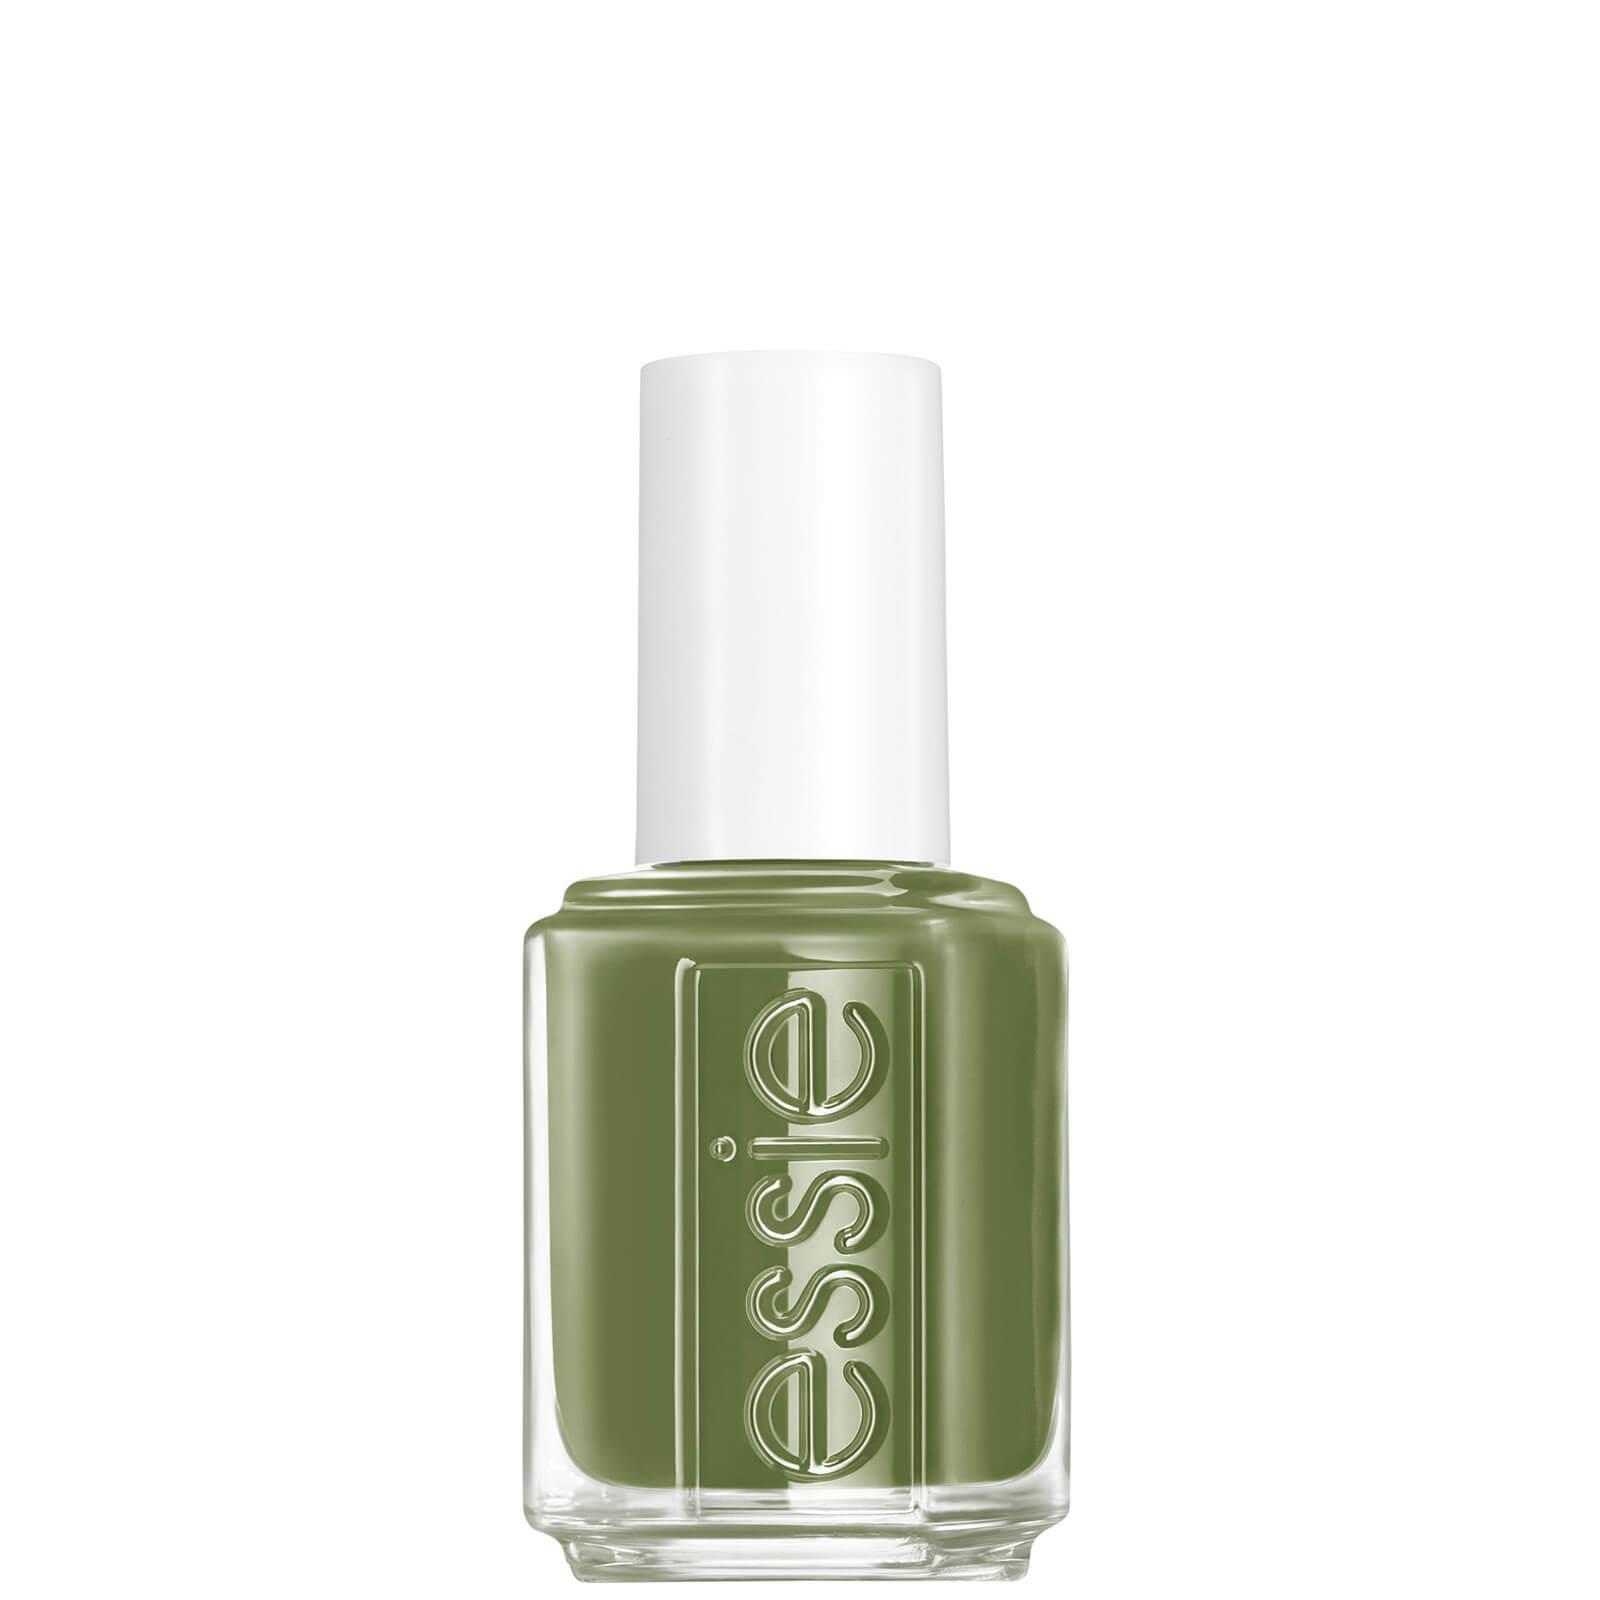 Купить Essie Core Nail Polish 13.5ml (Various Shades) - 789 Win Me Over